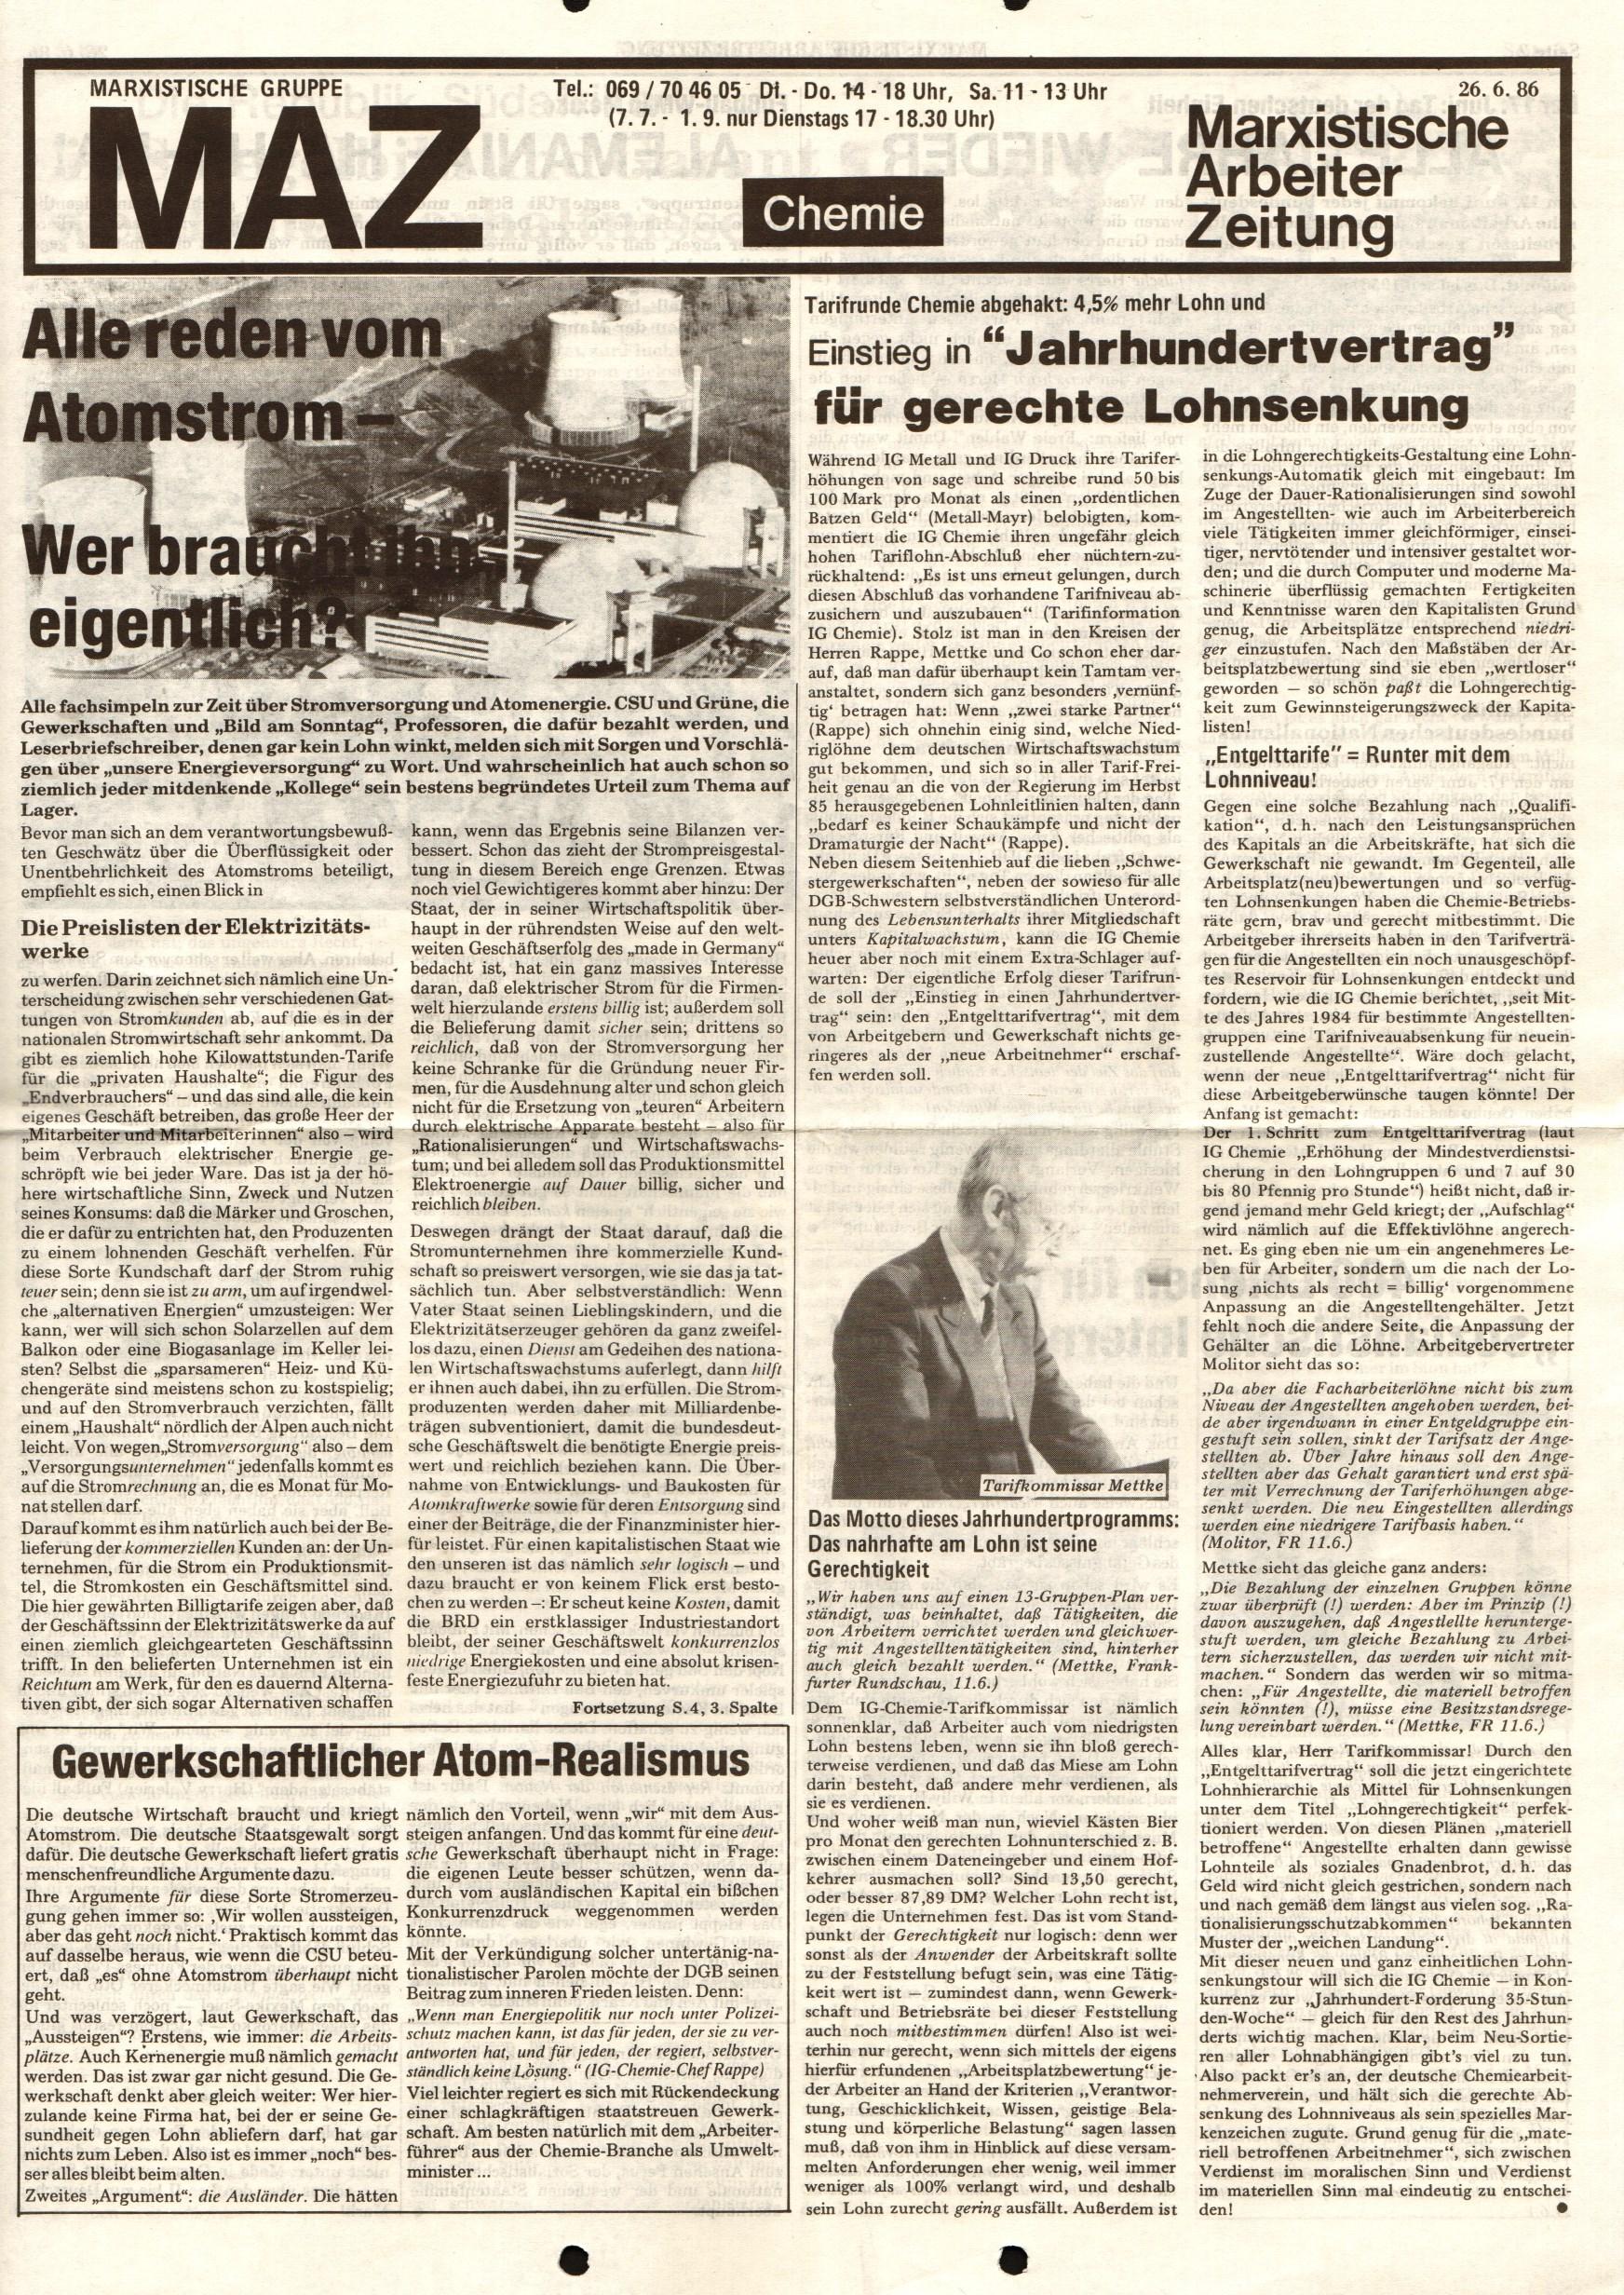 Frankfurt_CPK_Hoechst_MAZ385